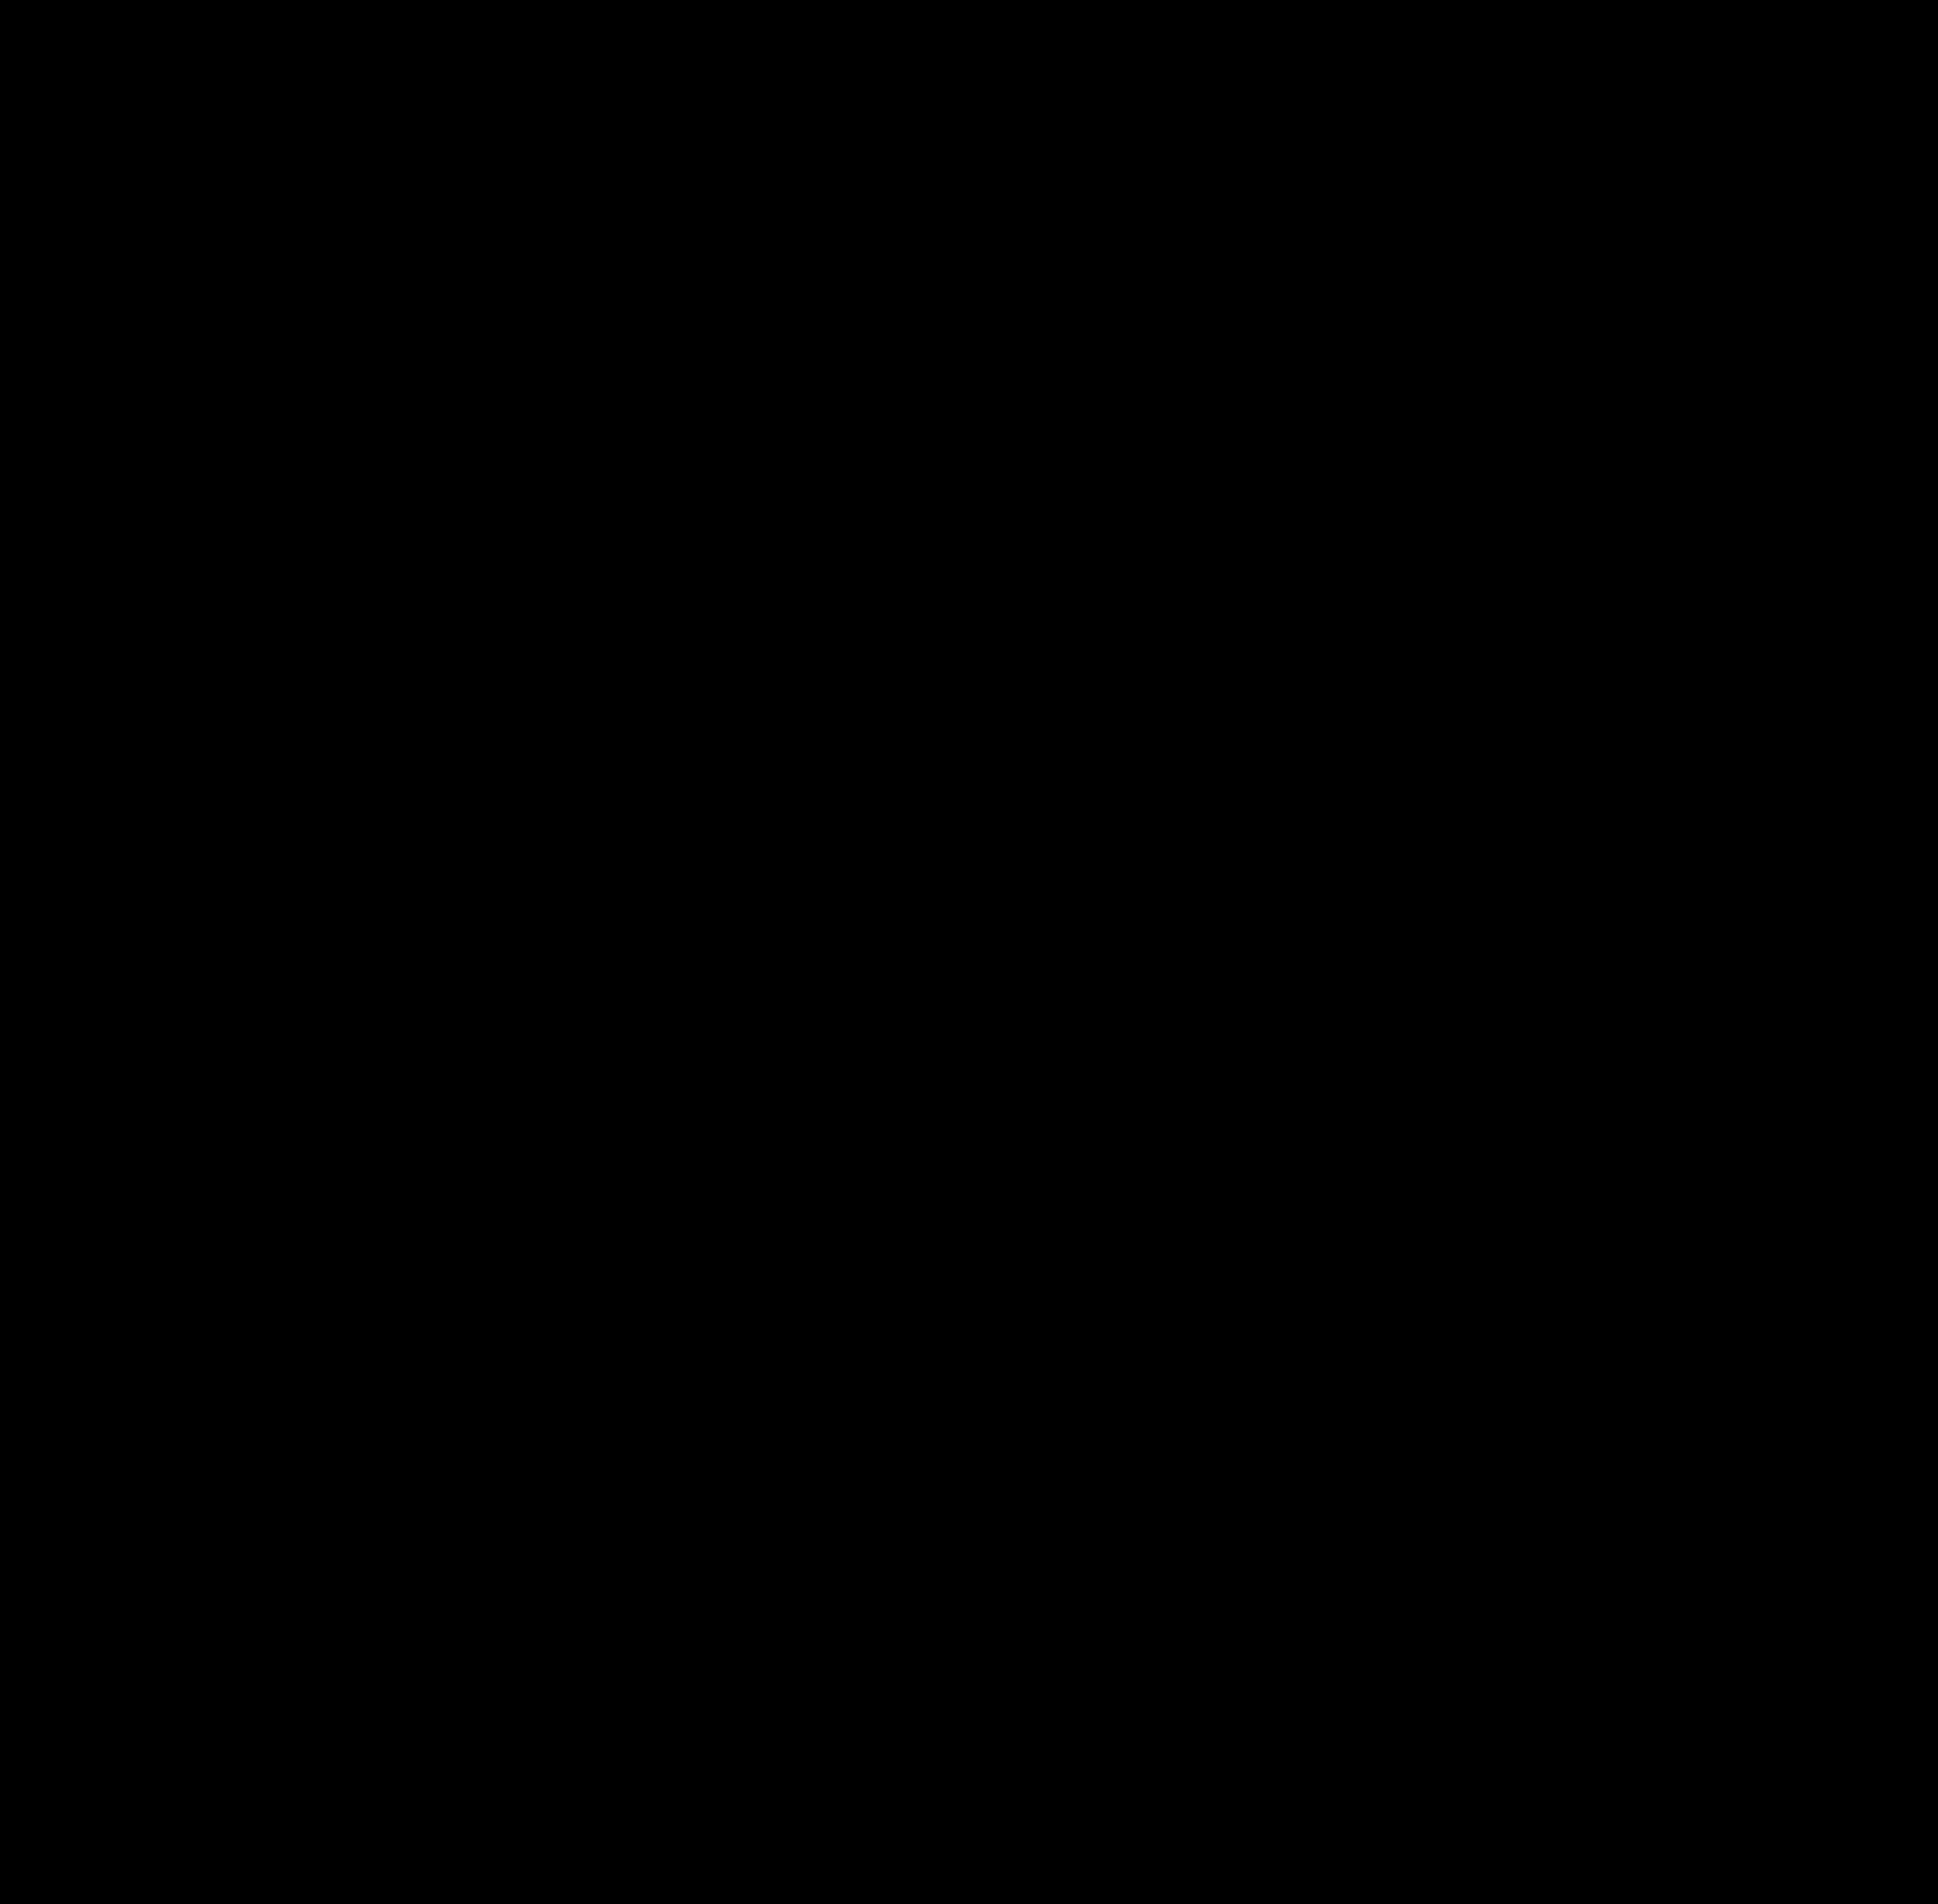 2314x2274 Silhouette Of Dandelion Flower. Silhouette Of Beautiful Vector